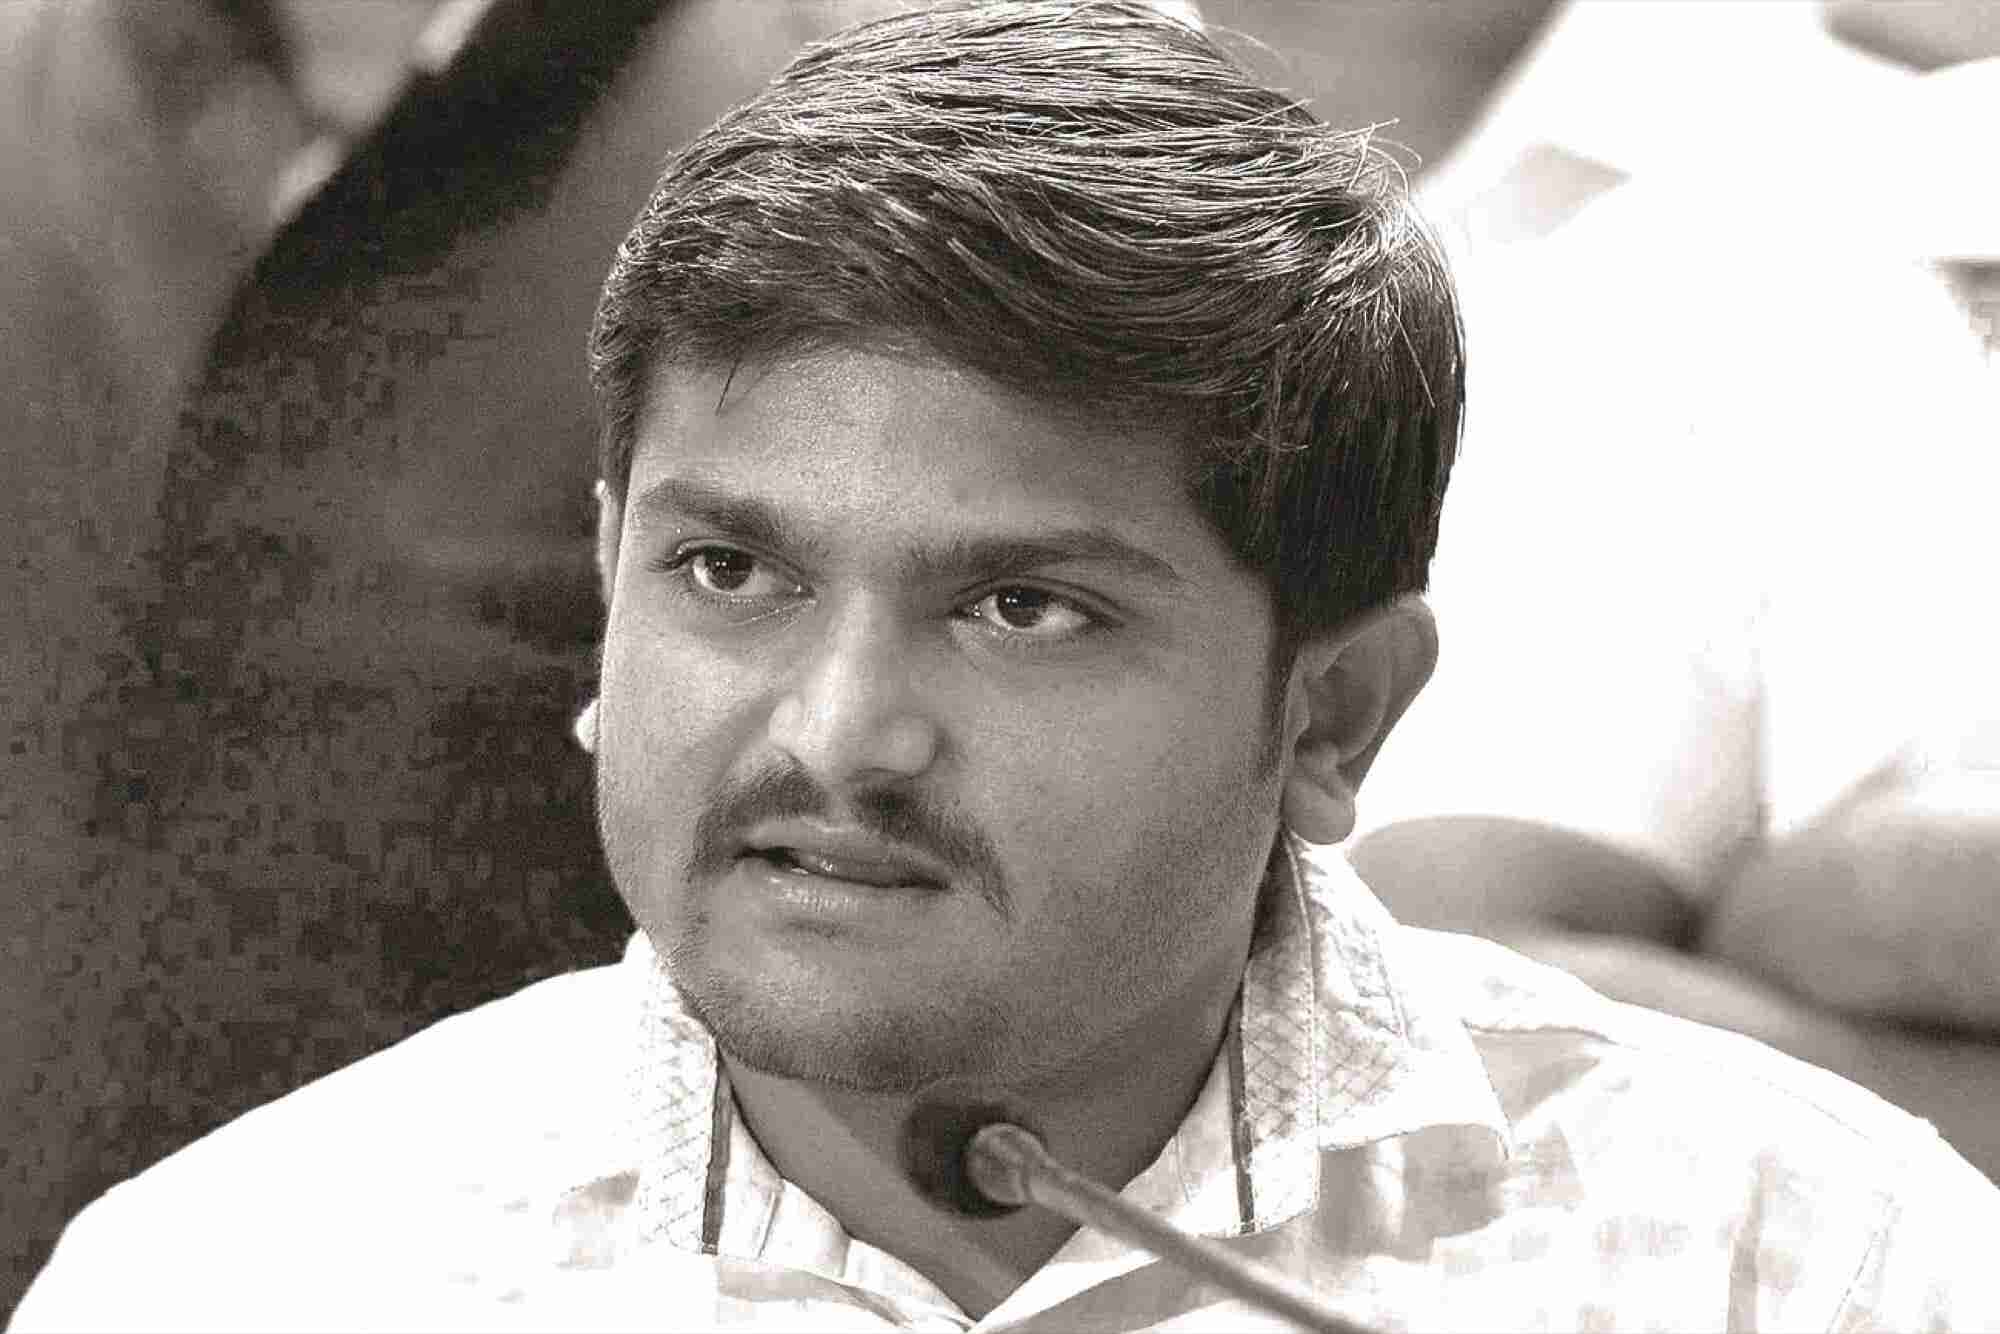 Hardik Patel and His Road to Activism